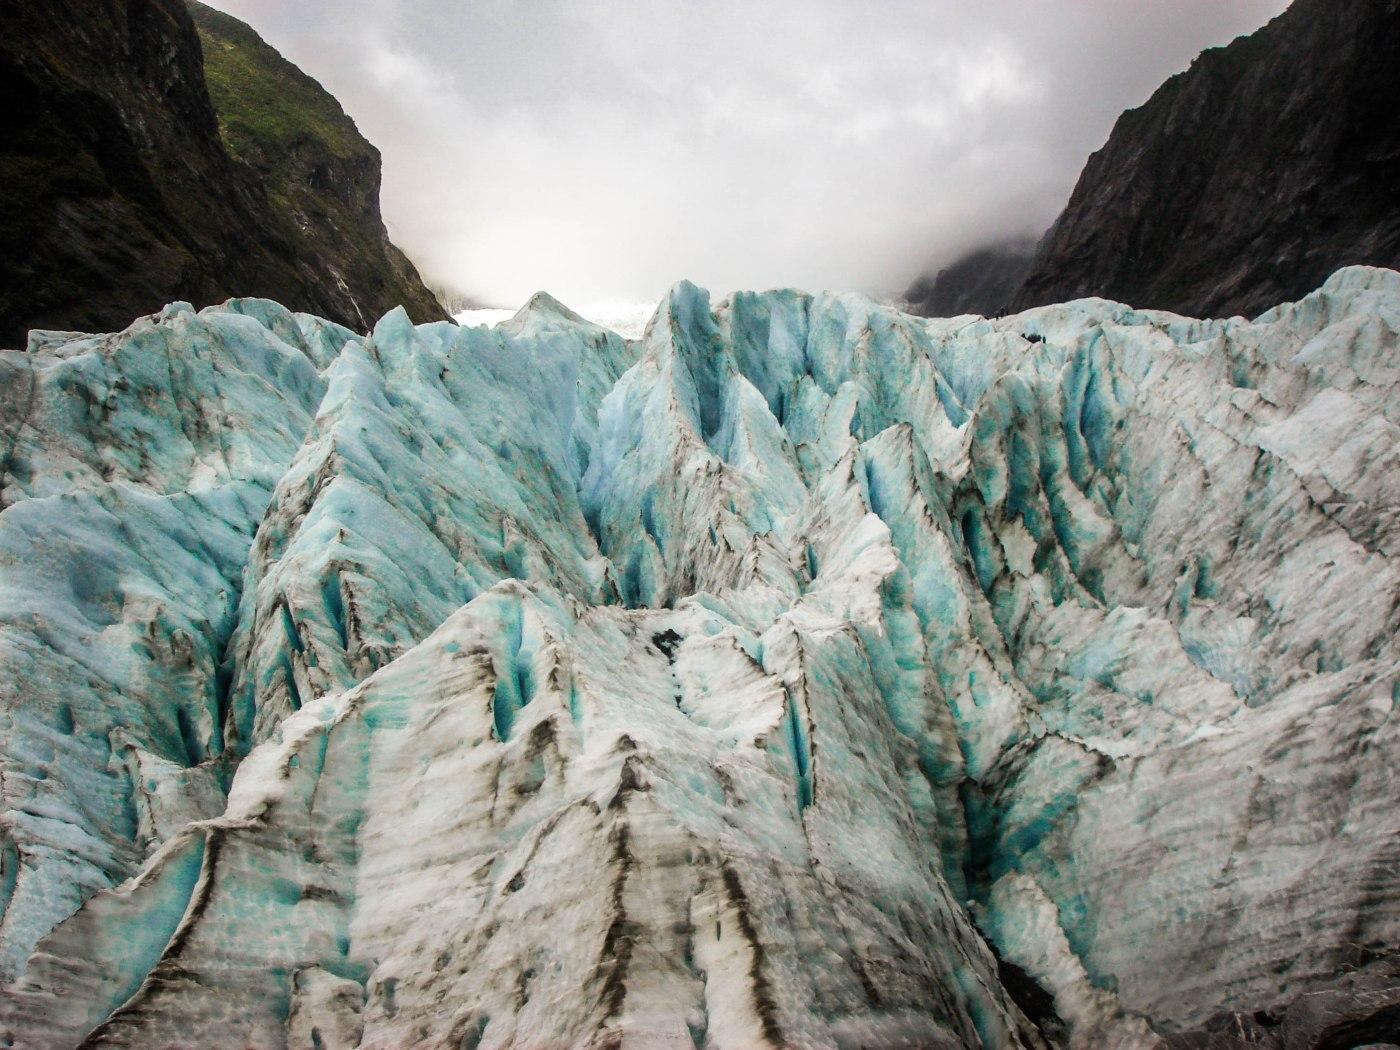 Glacier hiking in Franz Josef